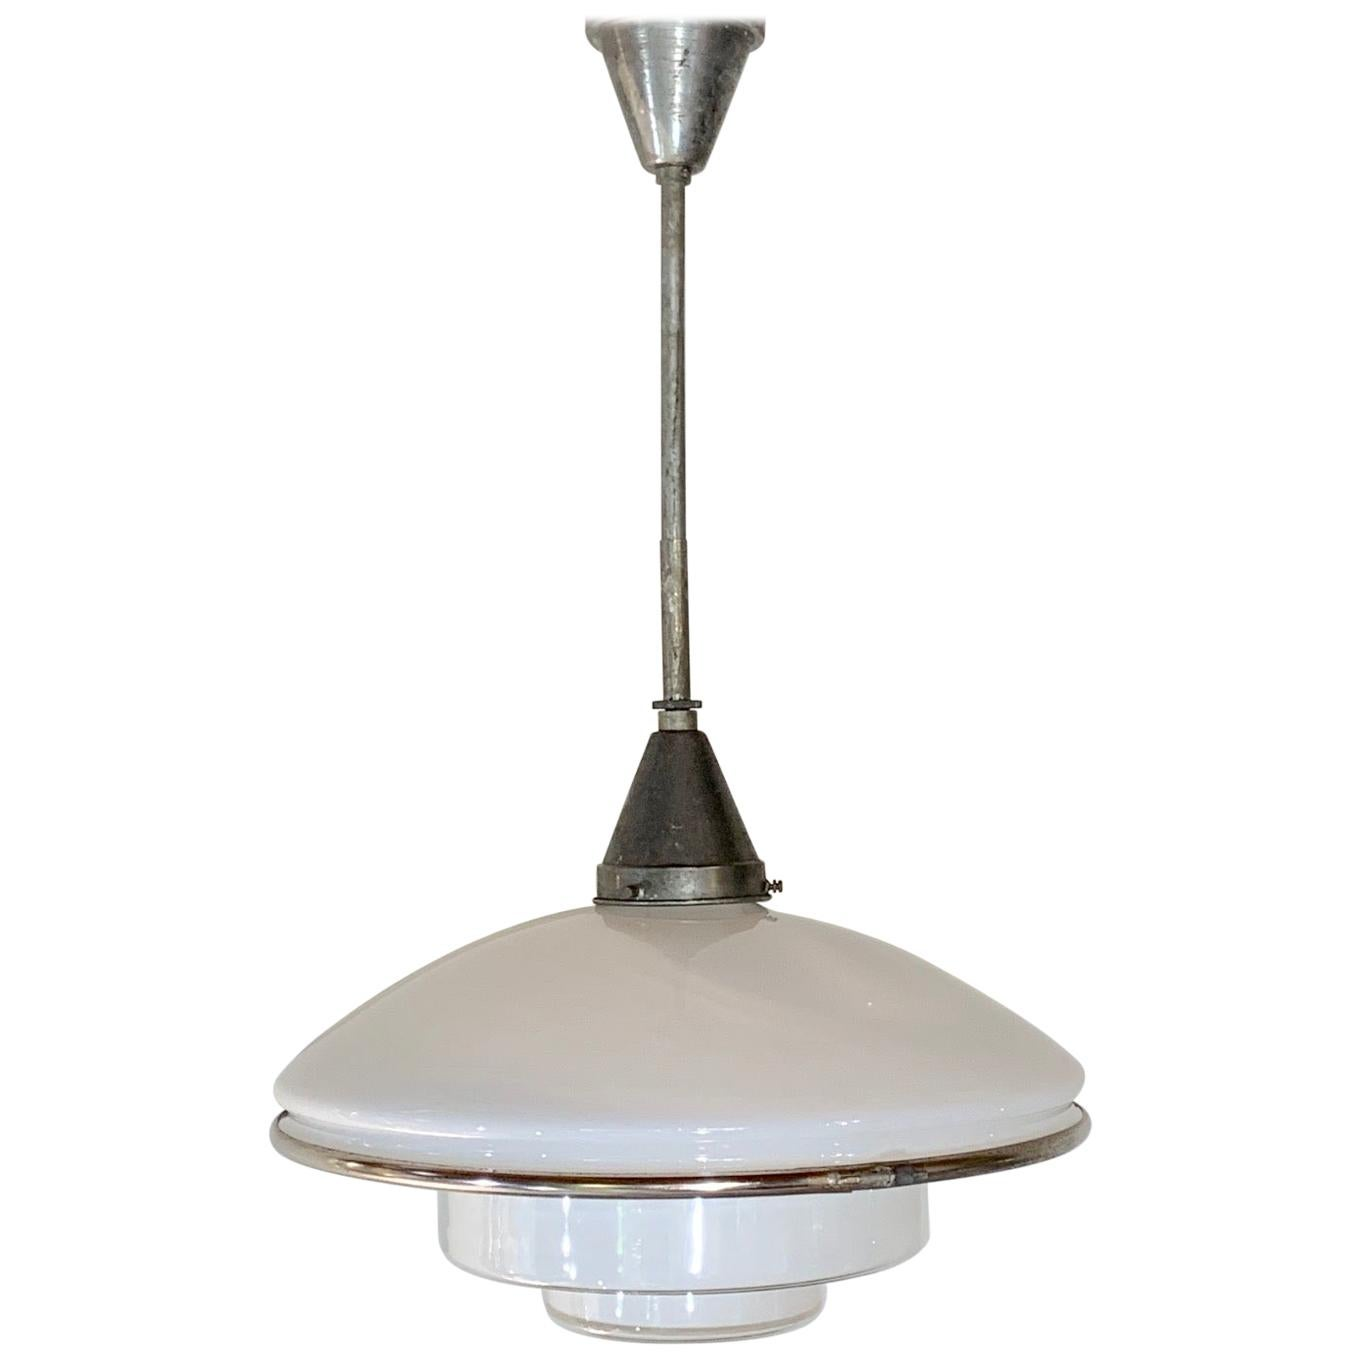 Otto Muller Pendant Light P4